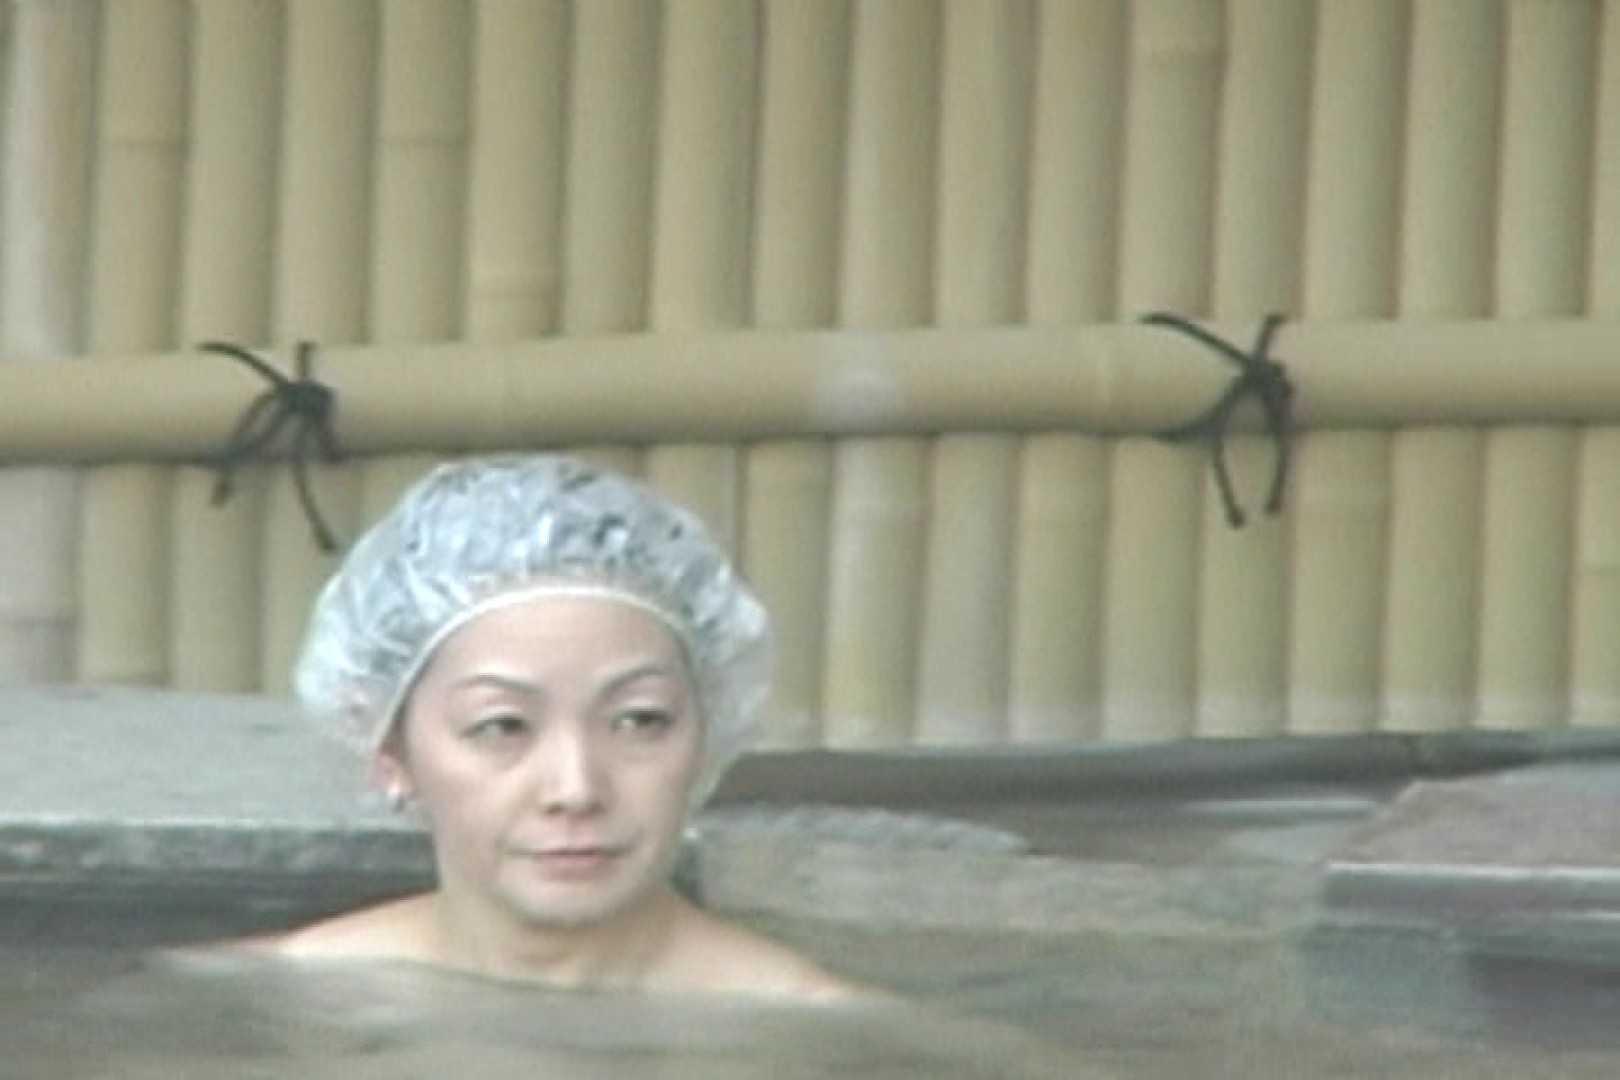 Aquaな露天風呂Vol.592 盗撮師作品  91pic 27